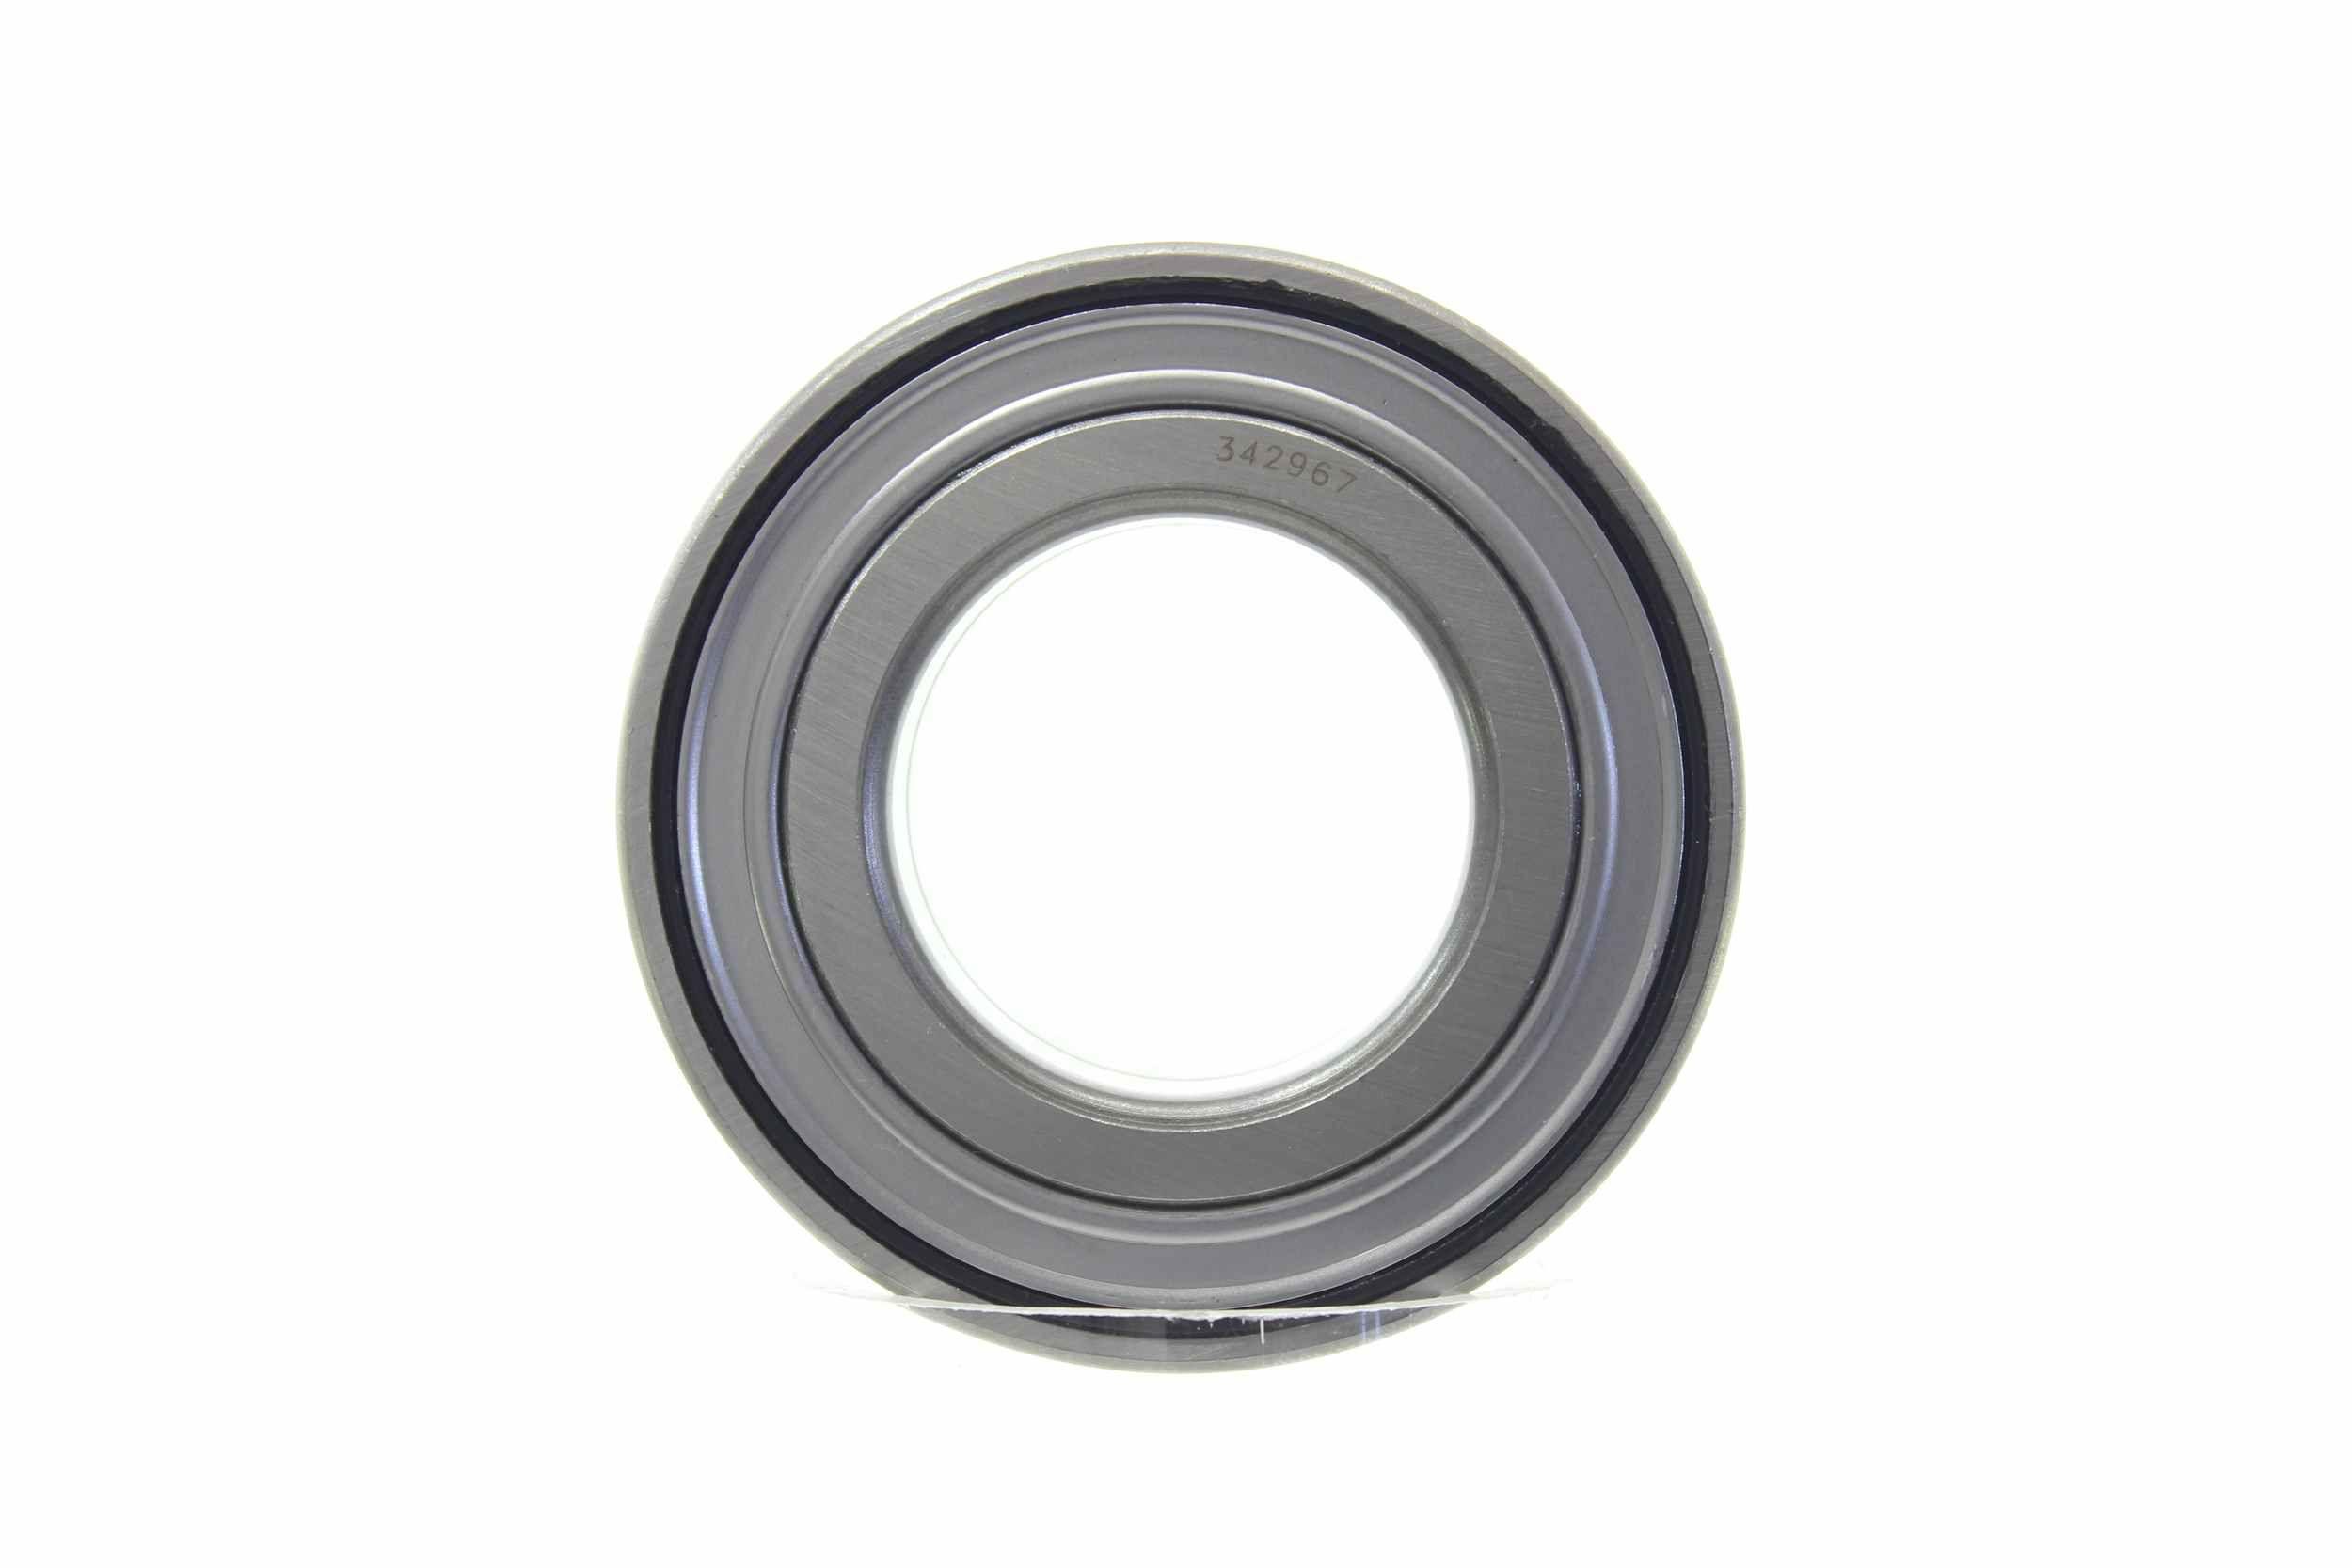 Wheel Hub Bearing 10342967 ALANKO 10342967 original quality